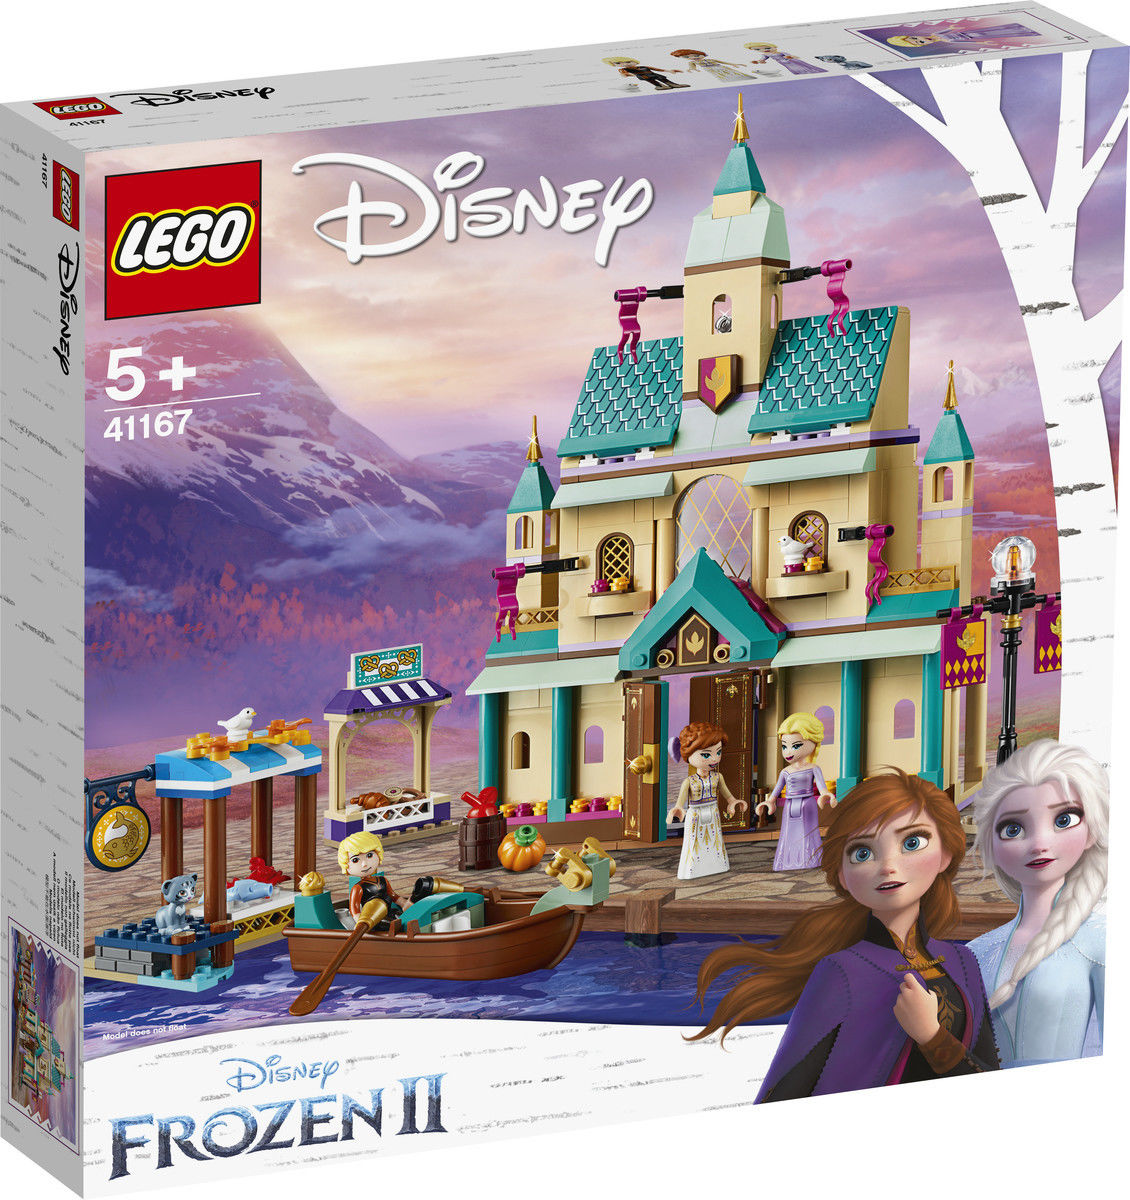 LEGO Disney Princess - Zamkowa wioska w Arendelle 41167